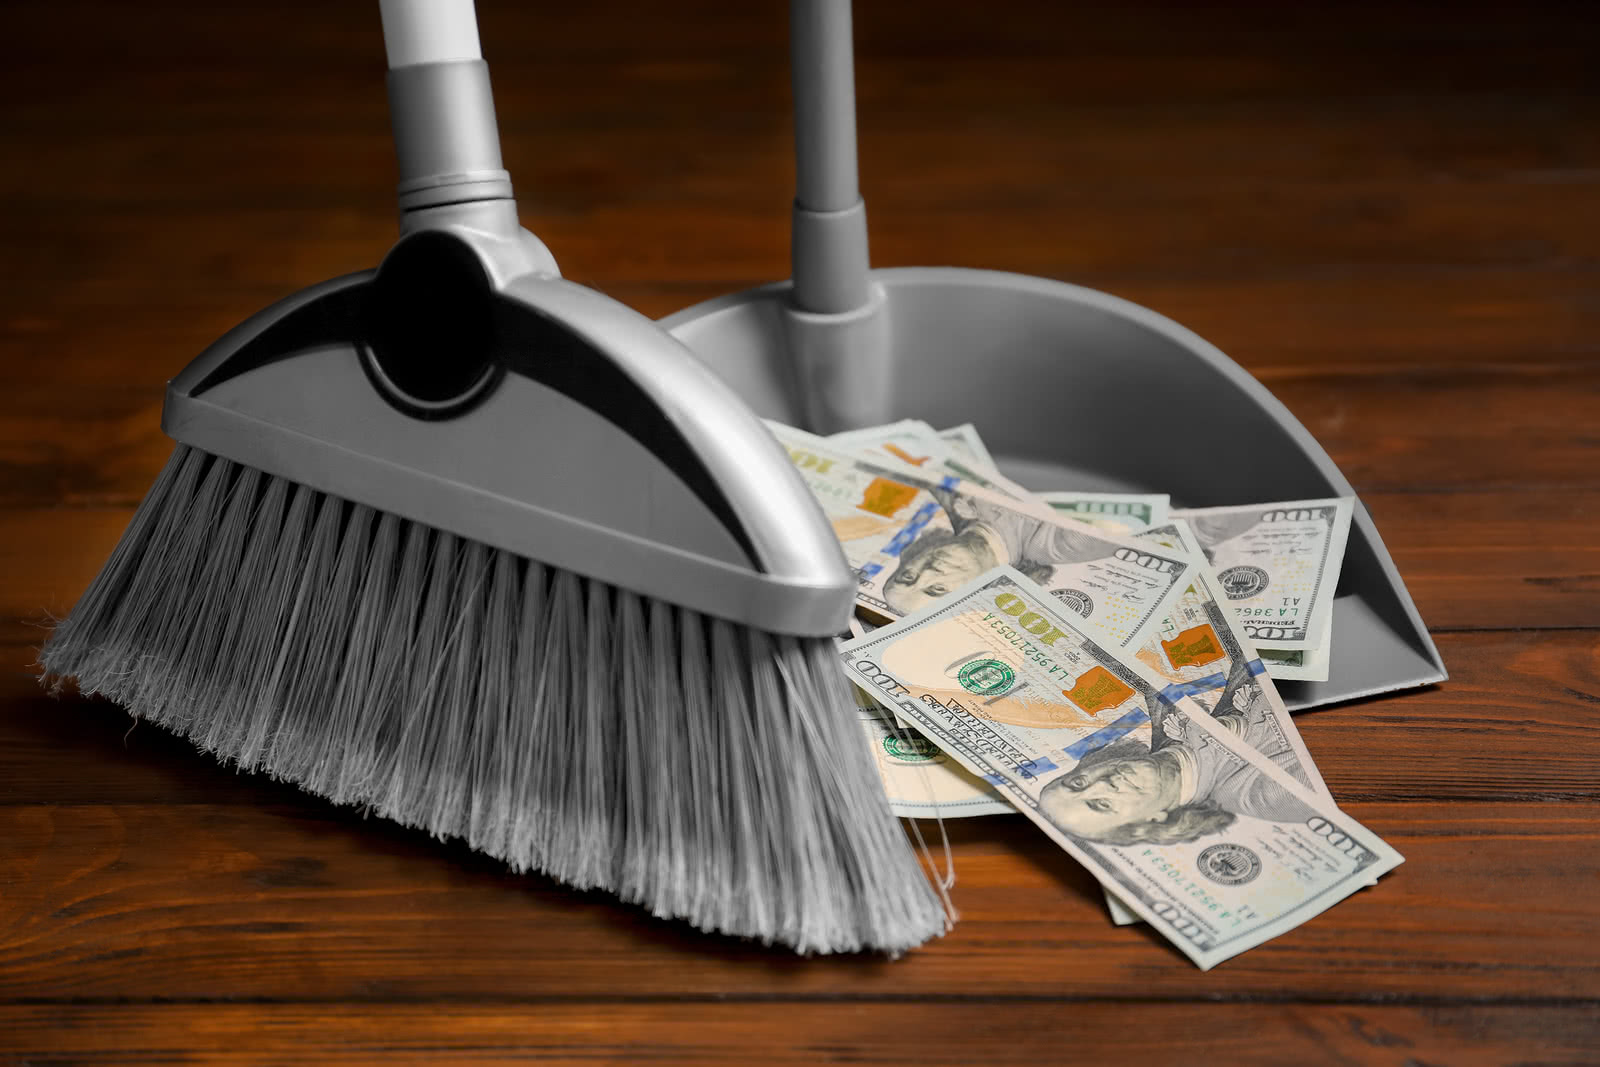 Sweeping dollars into dustpan